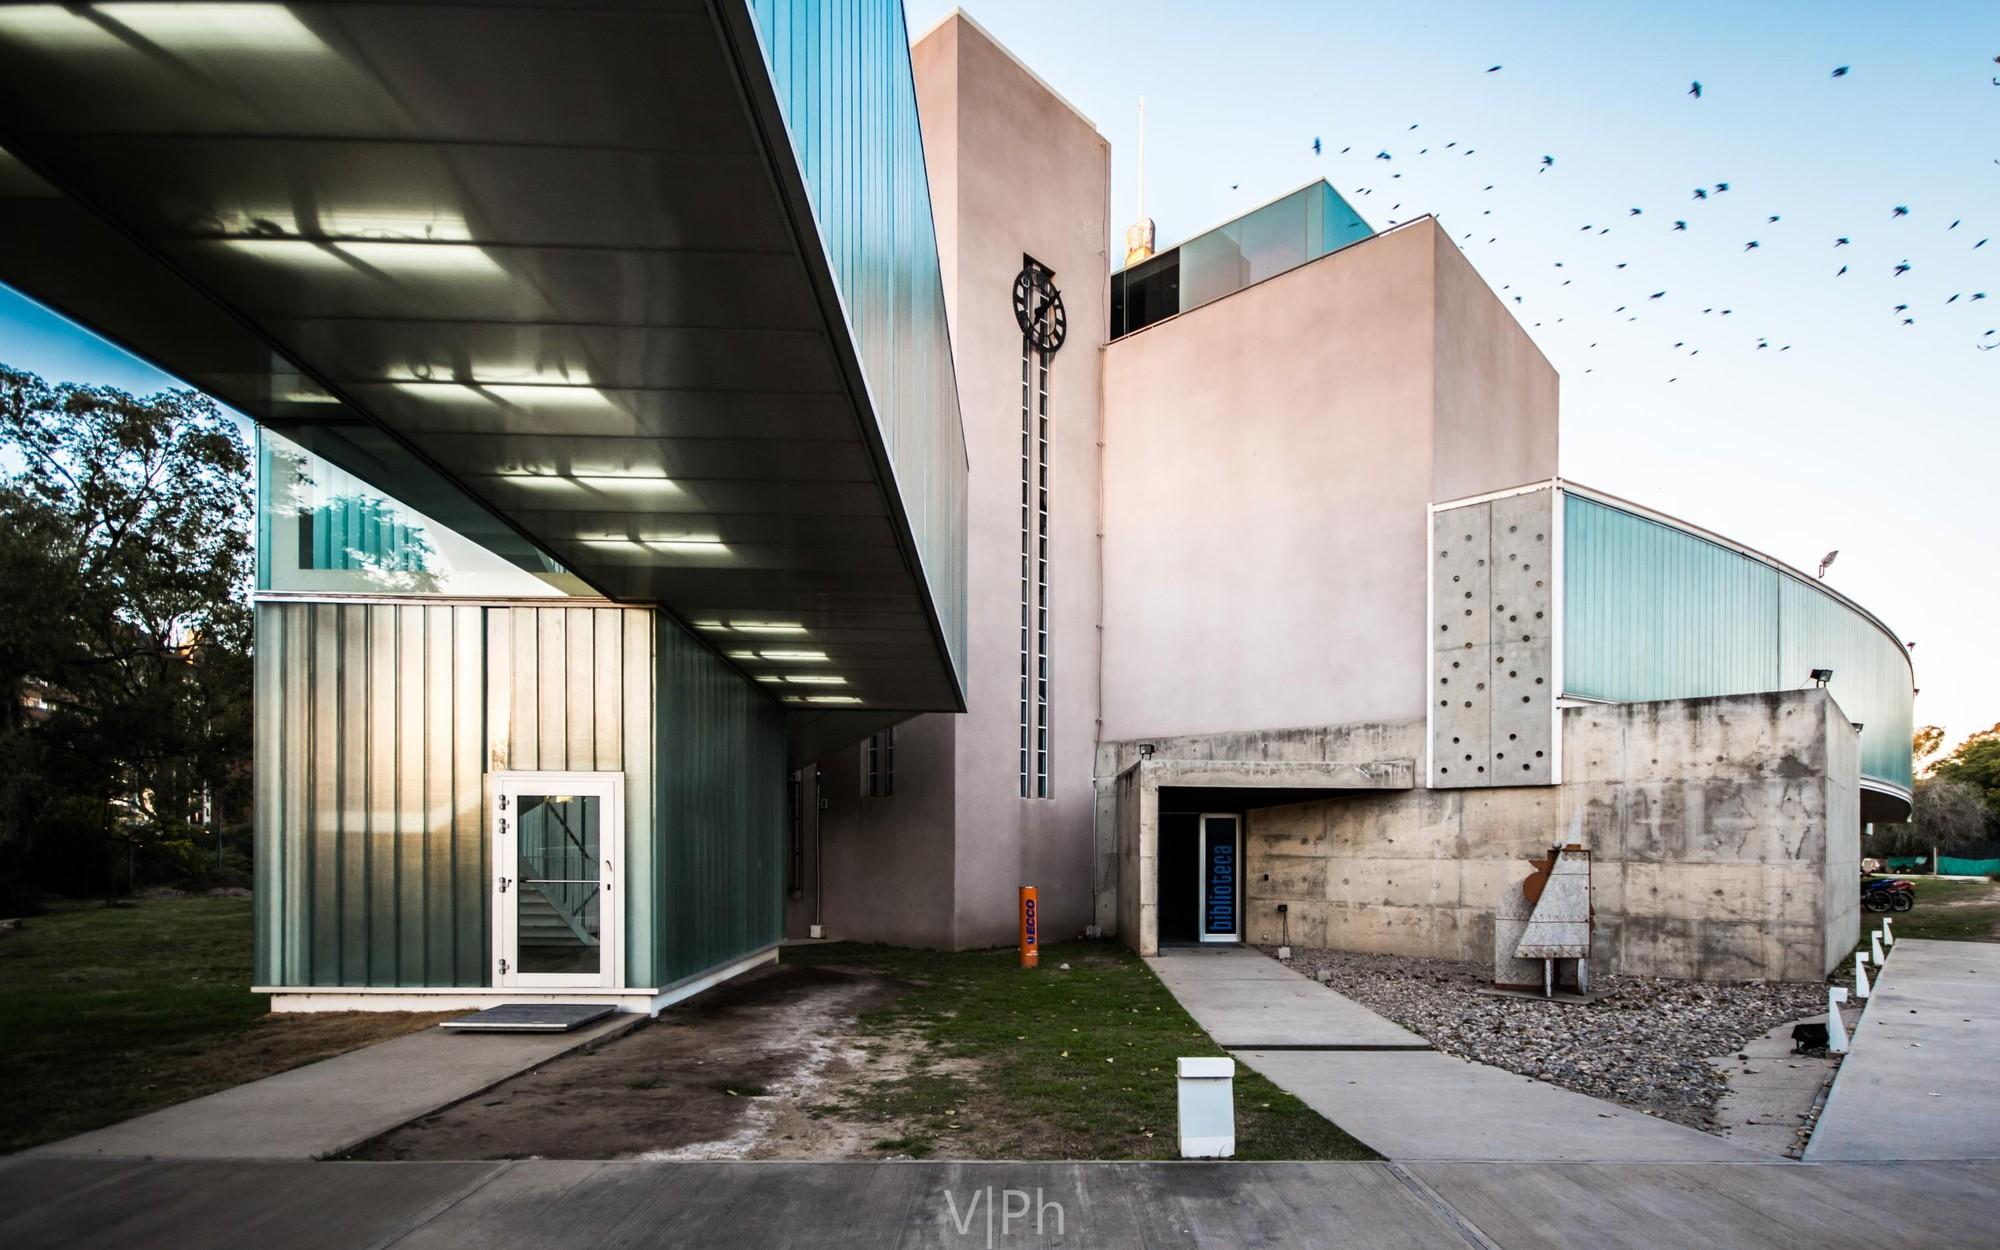 Museo Provincial de Bellas Artes Emilio Caraffa / Lucio Morini + GGMPU Arquitectos, © Gonzalo Viramonte